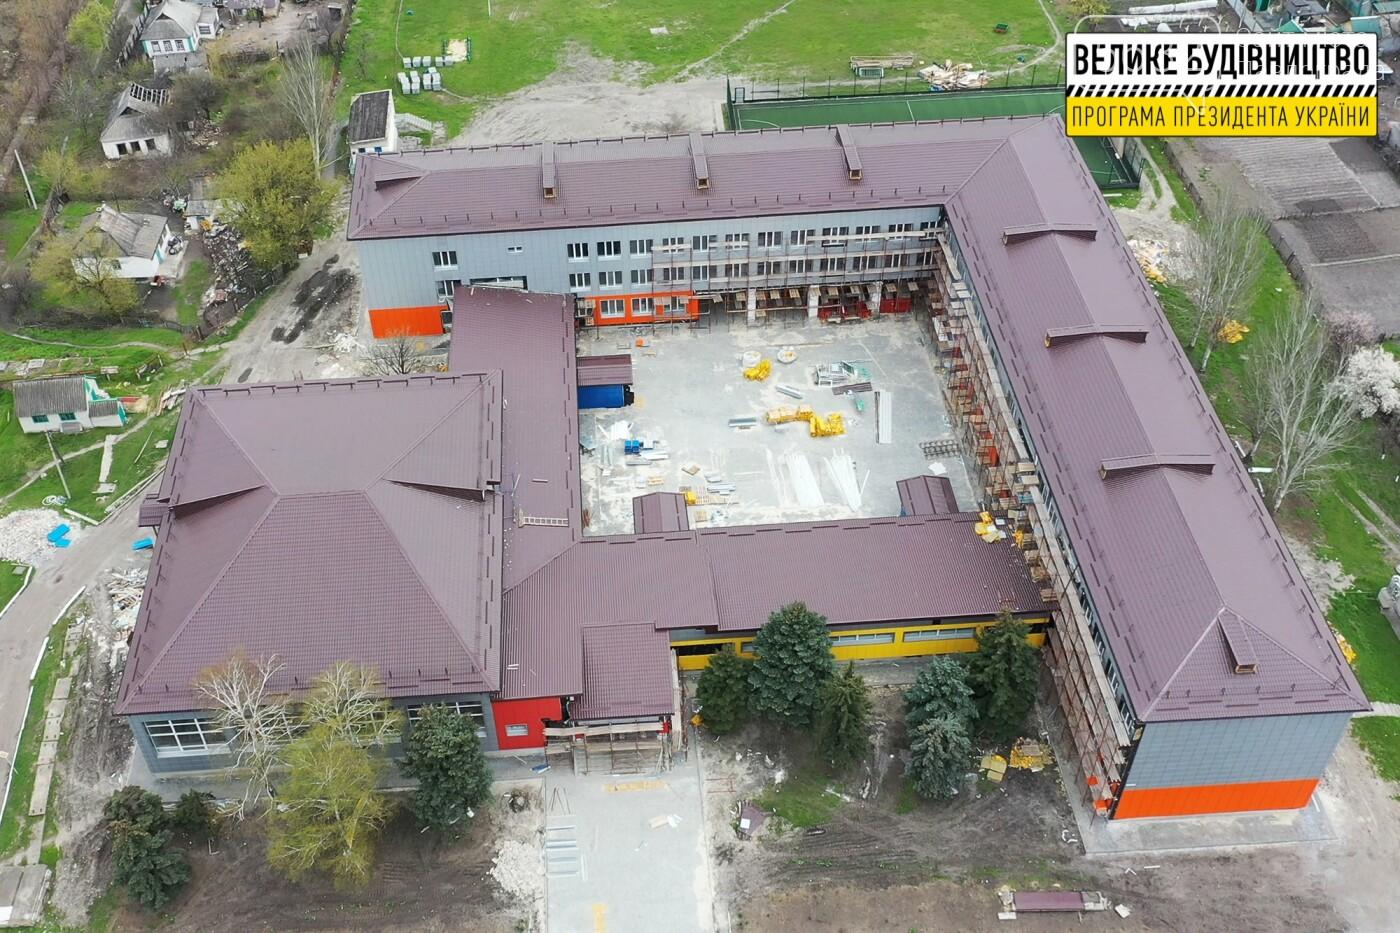 В Петропавловке модернизируют опорную школу (ФОТОРЕПОРТАЖ), фото-3